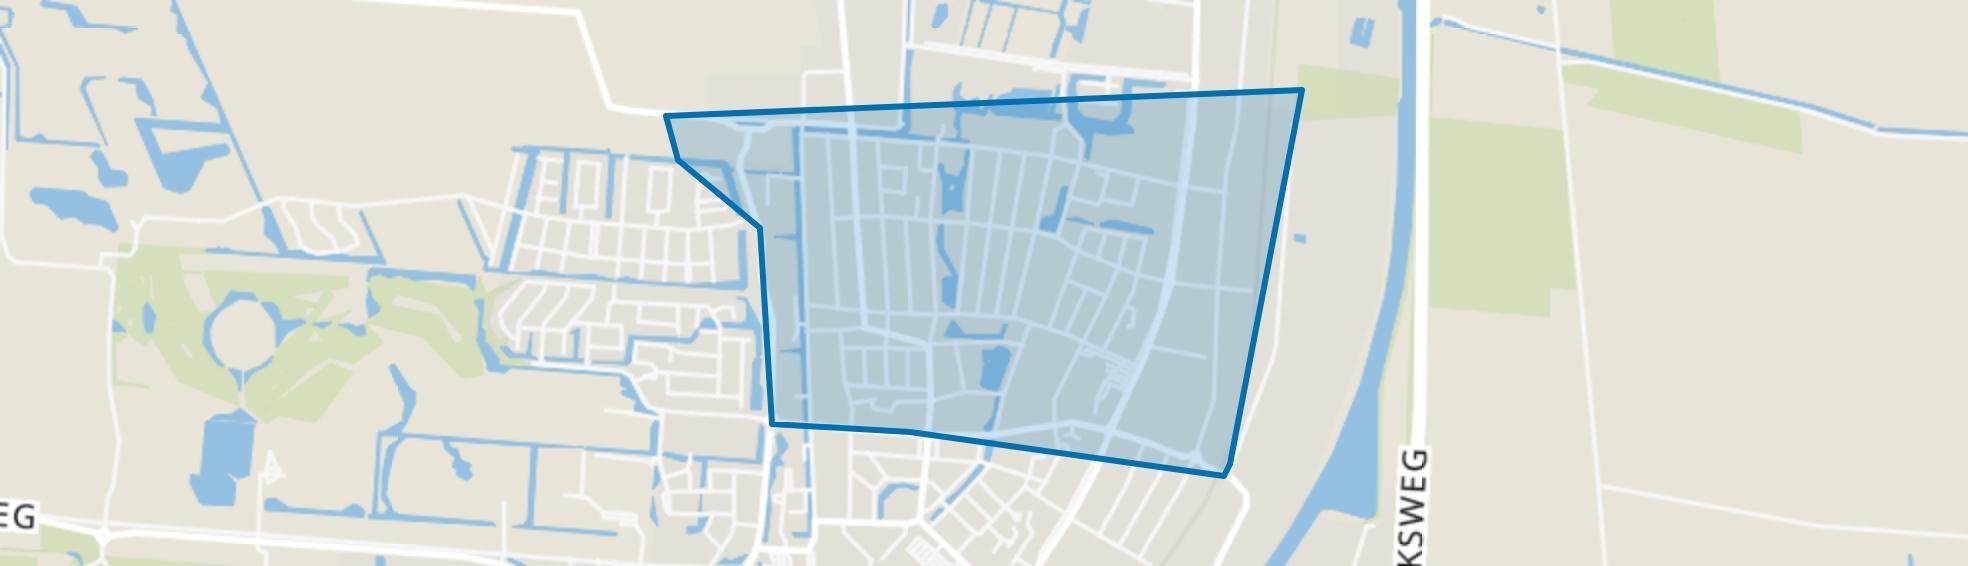 Veendam-Oude Ae, Veendam map